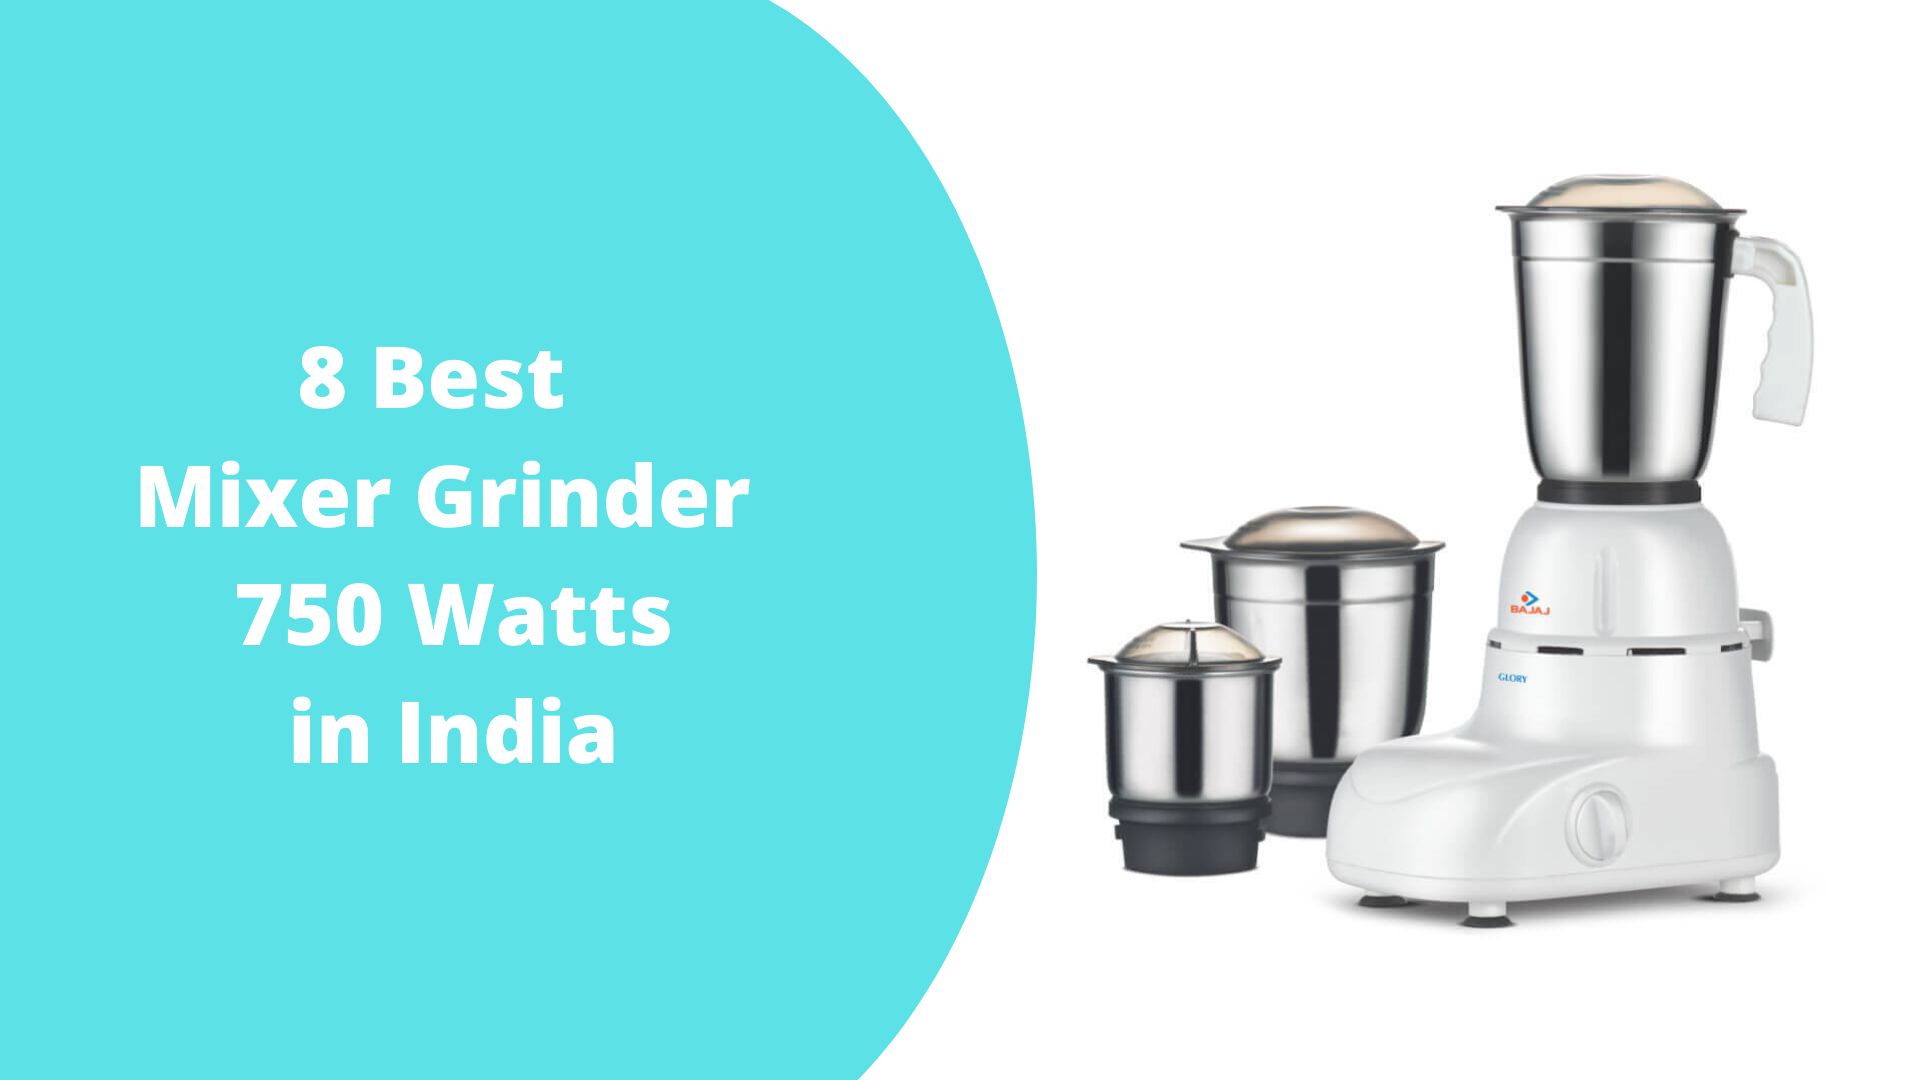 8 Best Mixer Grinder 750 Watts in India